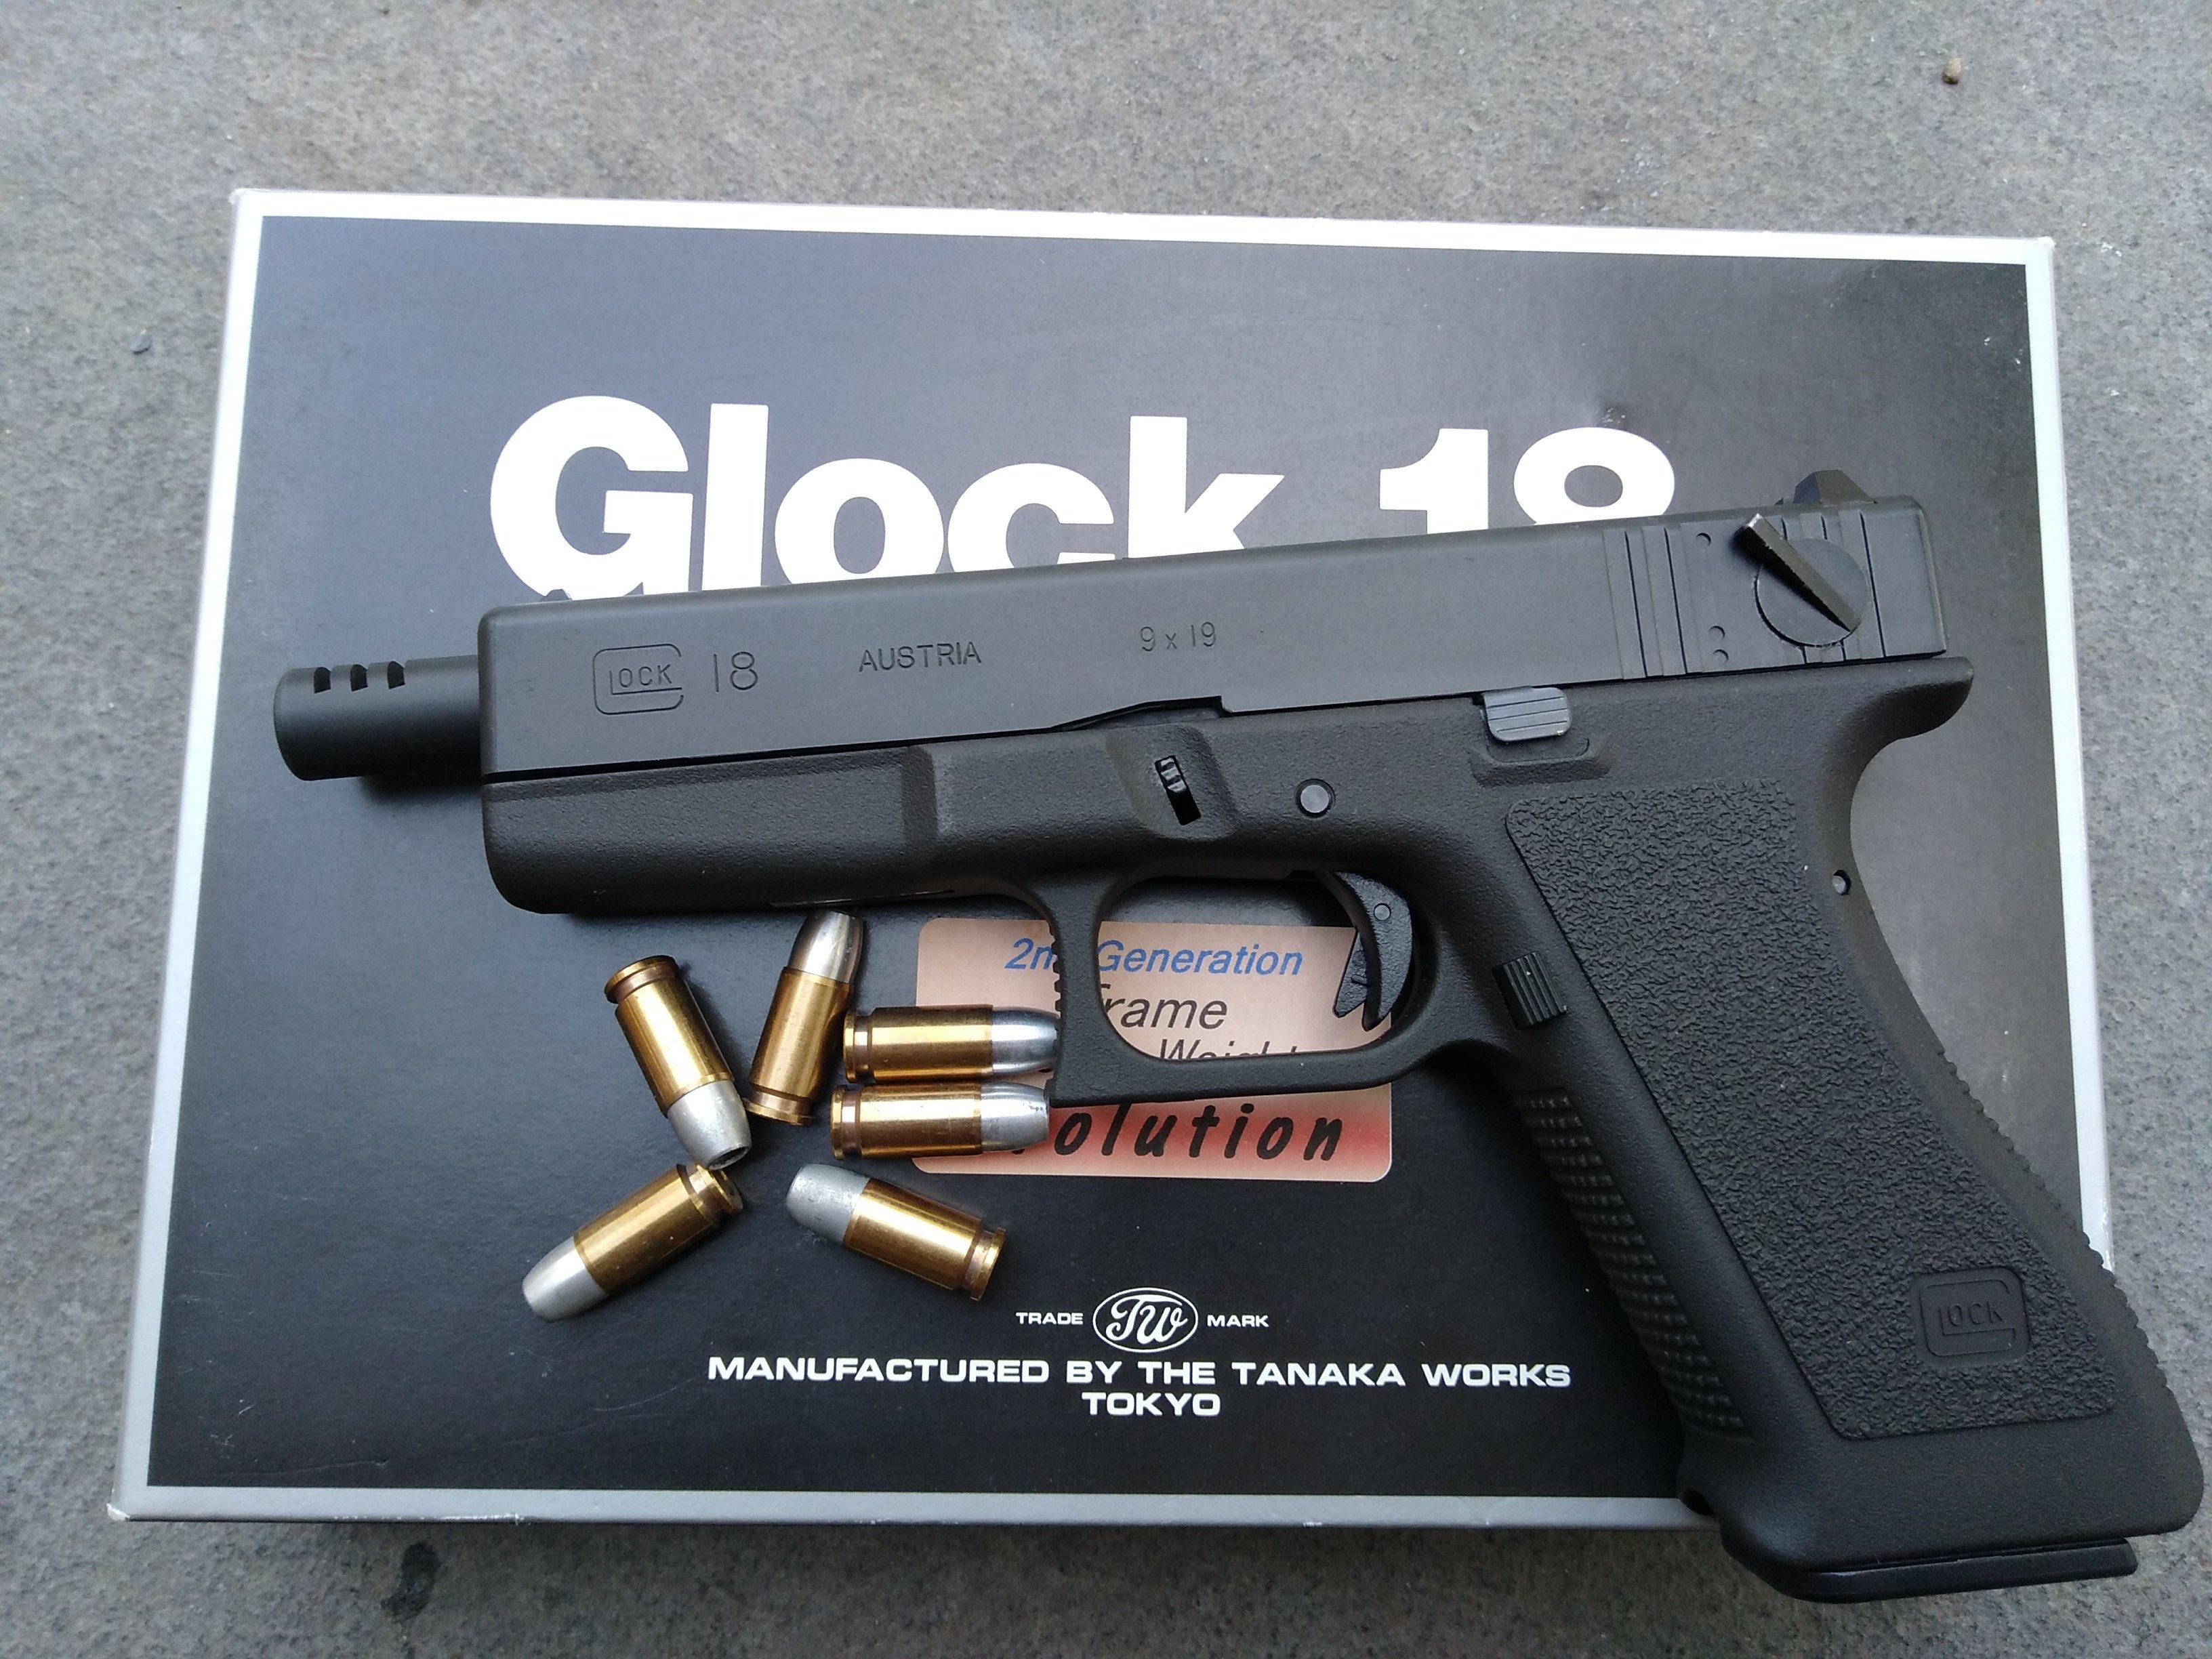 Tanaka Glock 18 2nd gen